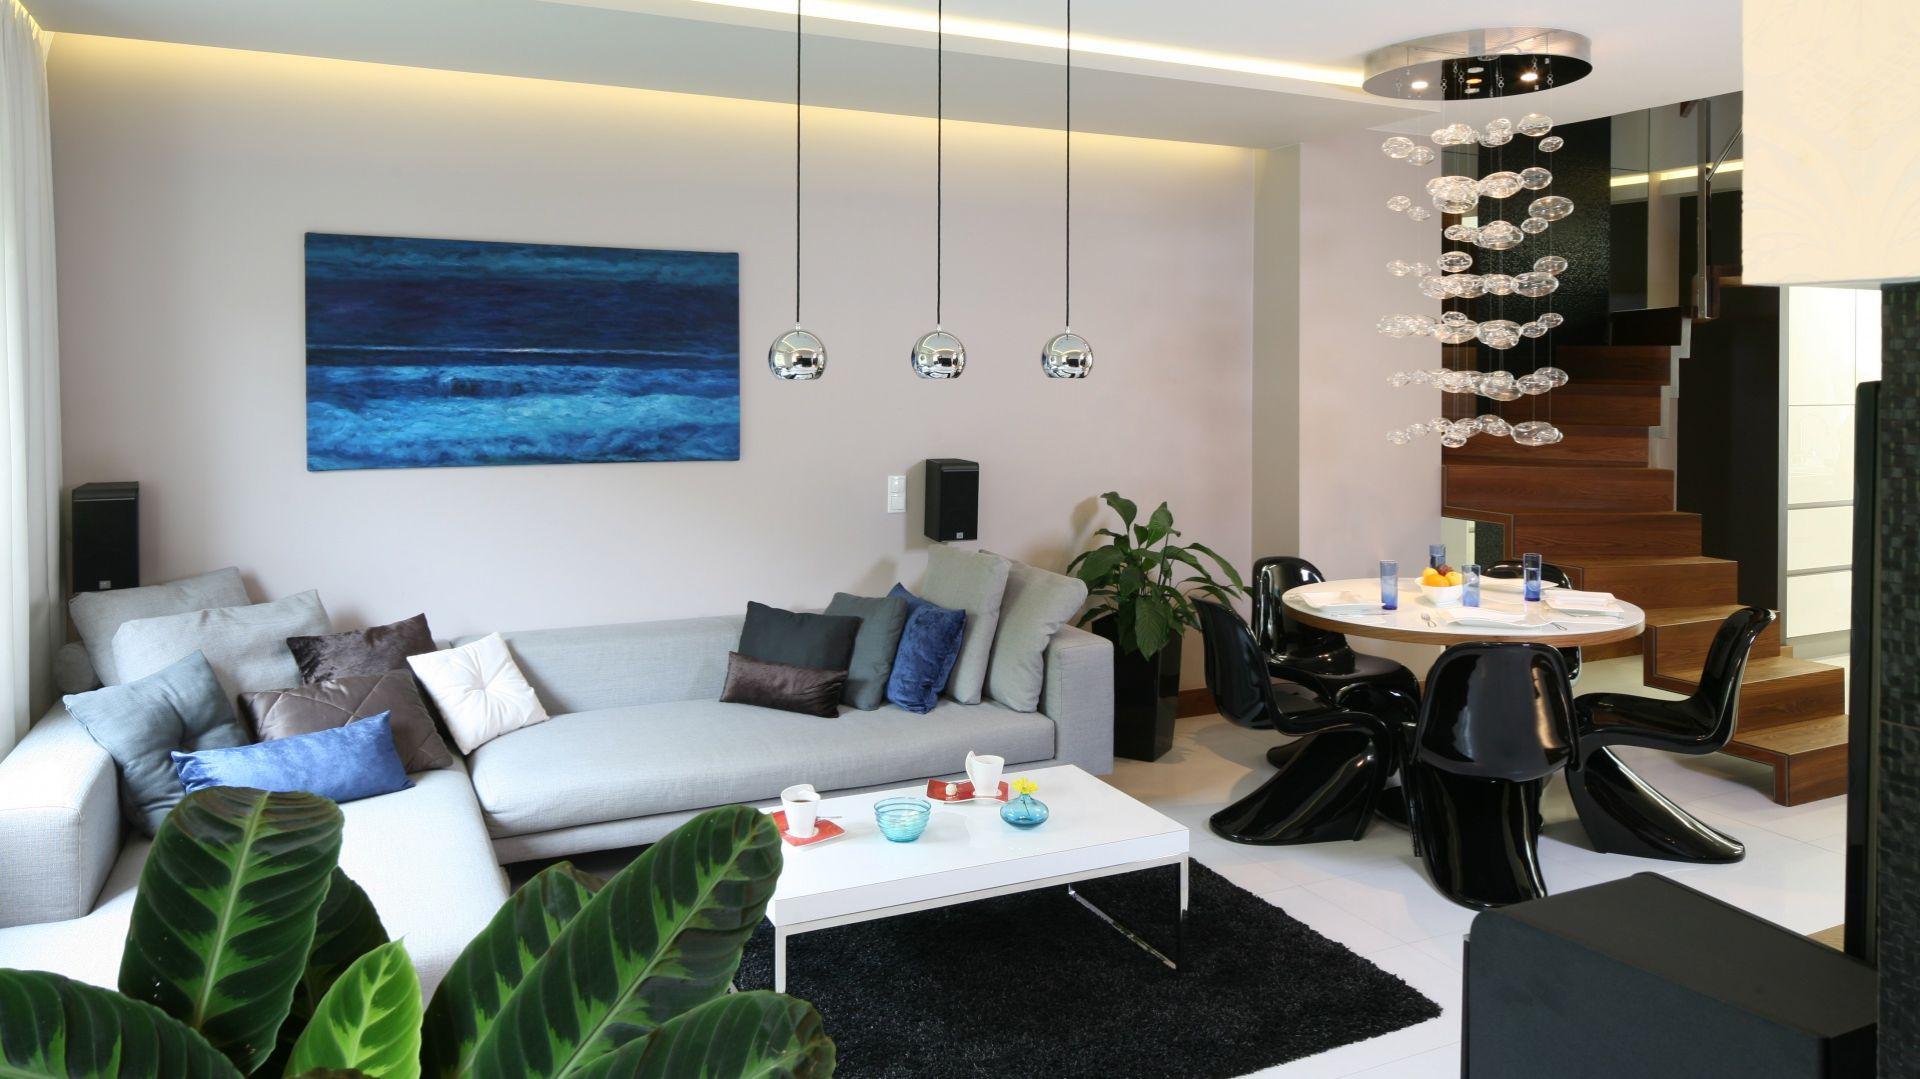 Szara sofa do salonu: propozycja numer 1. Projekt: Chantal Springer. Fot. Bartosz Jarosz